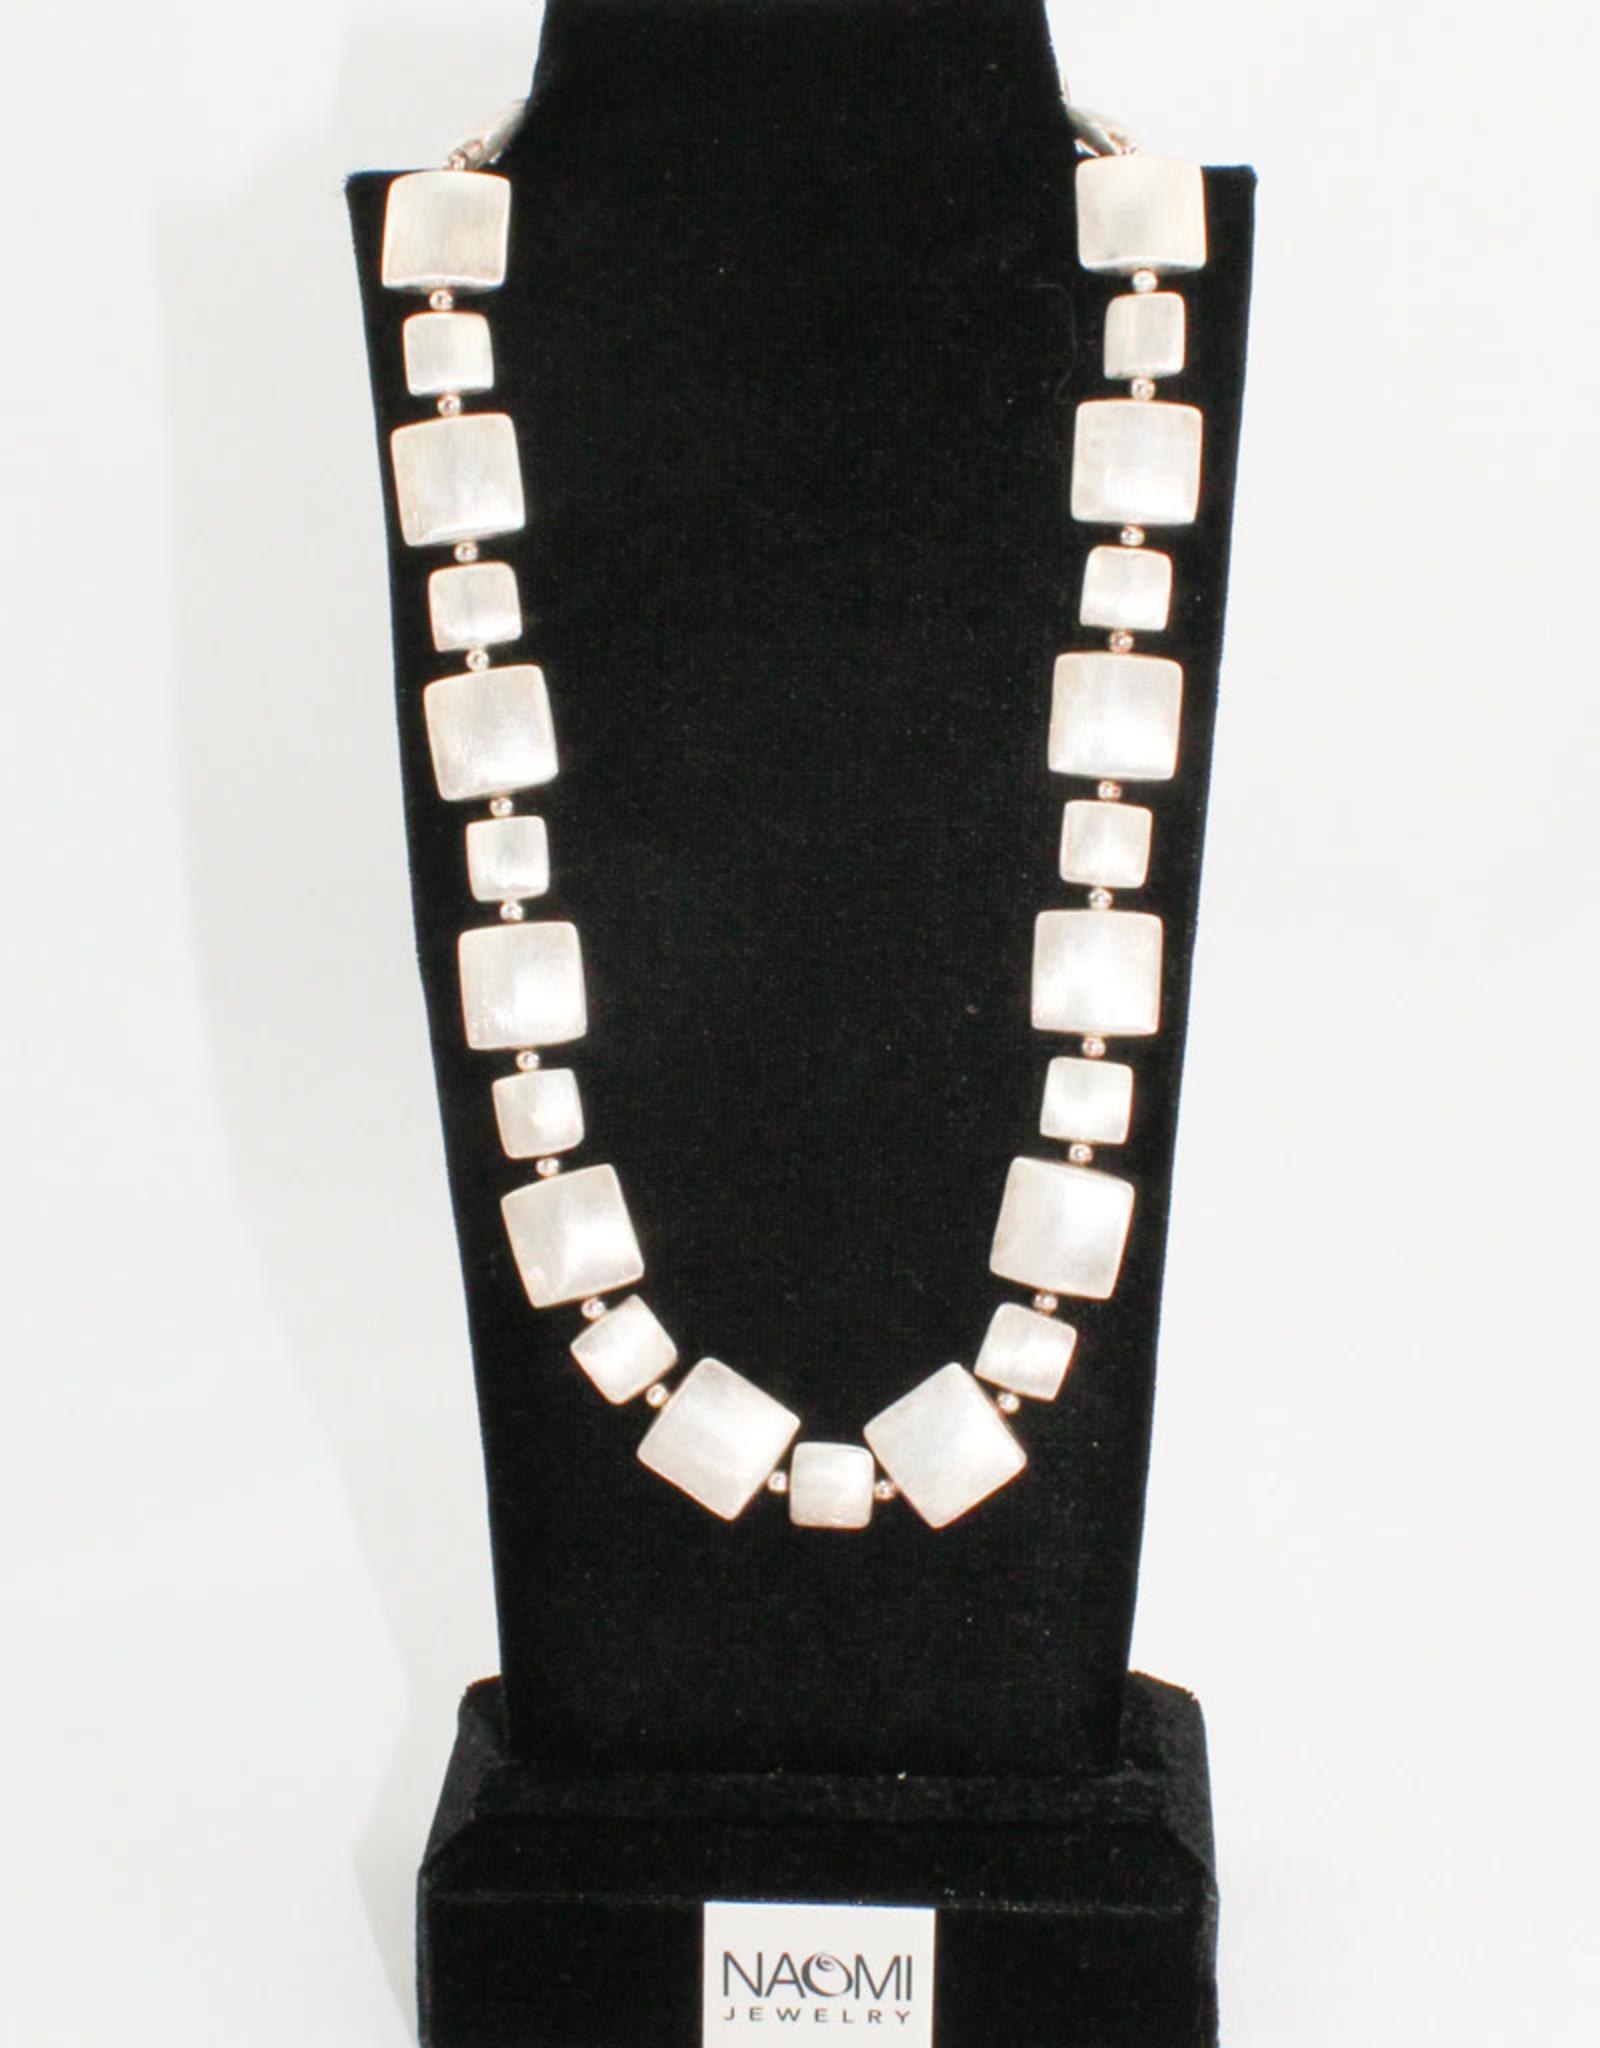 Naomi Jewelry Pillows Necklace